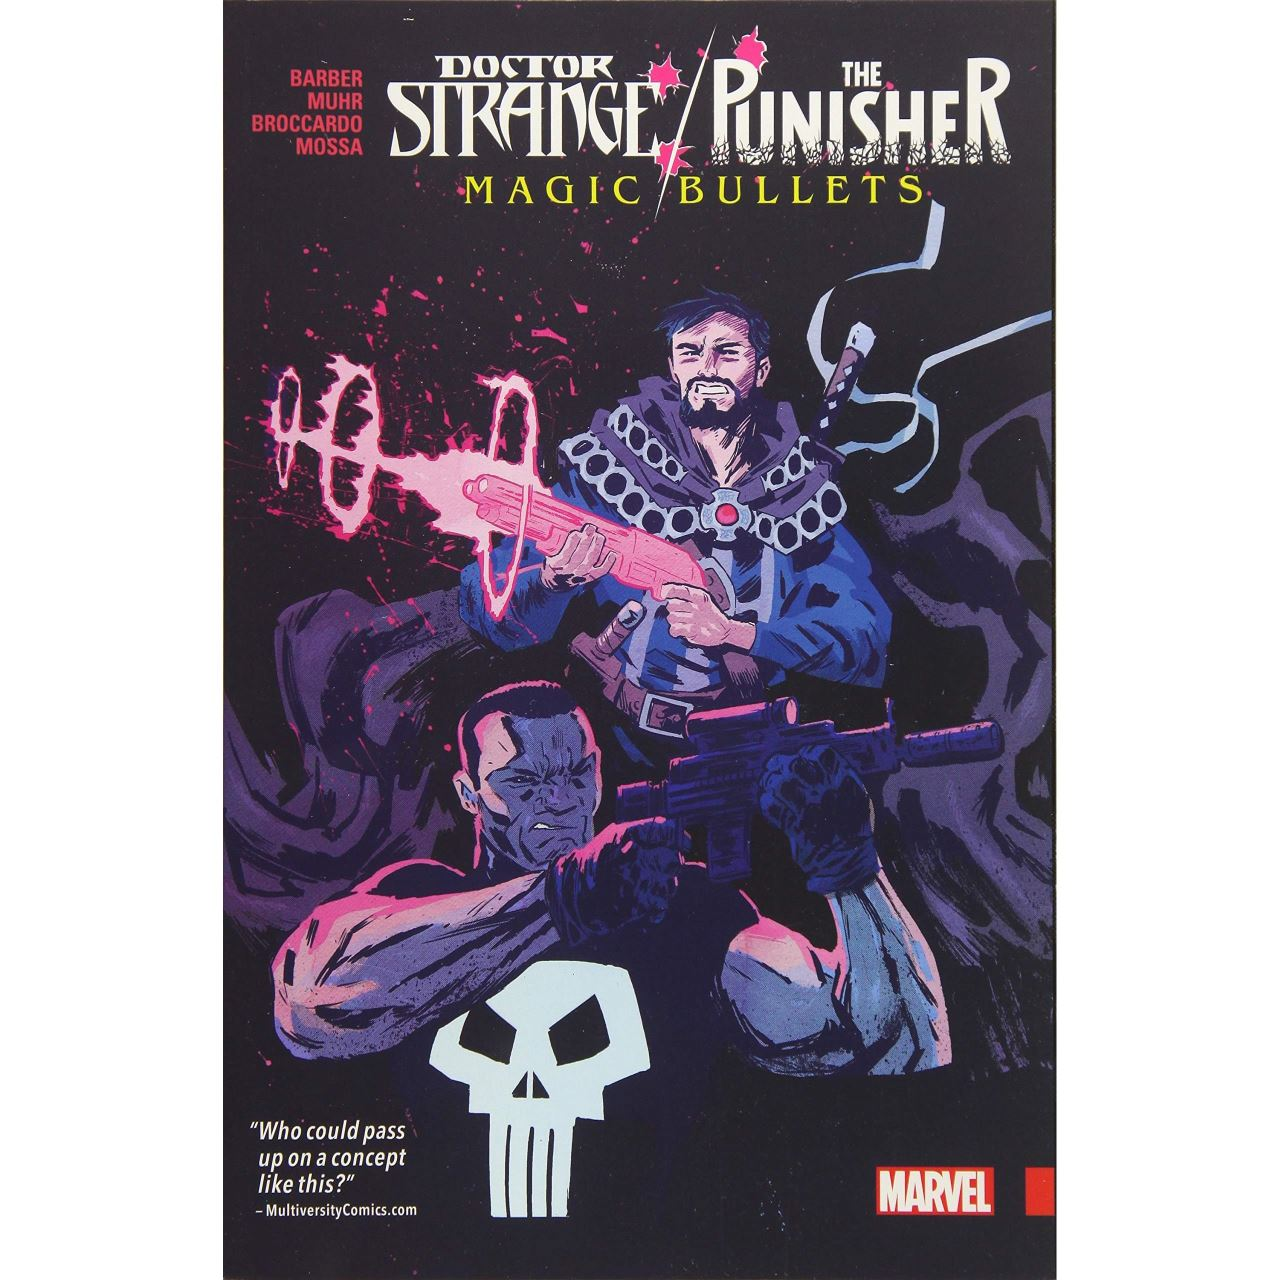 Doctor Strange/Punisher: Magic Bullets imagine